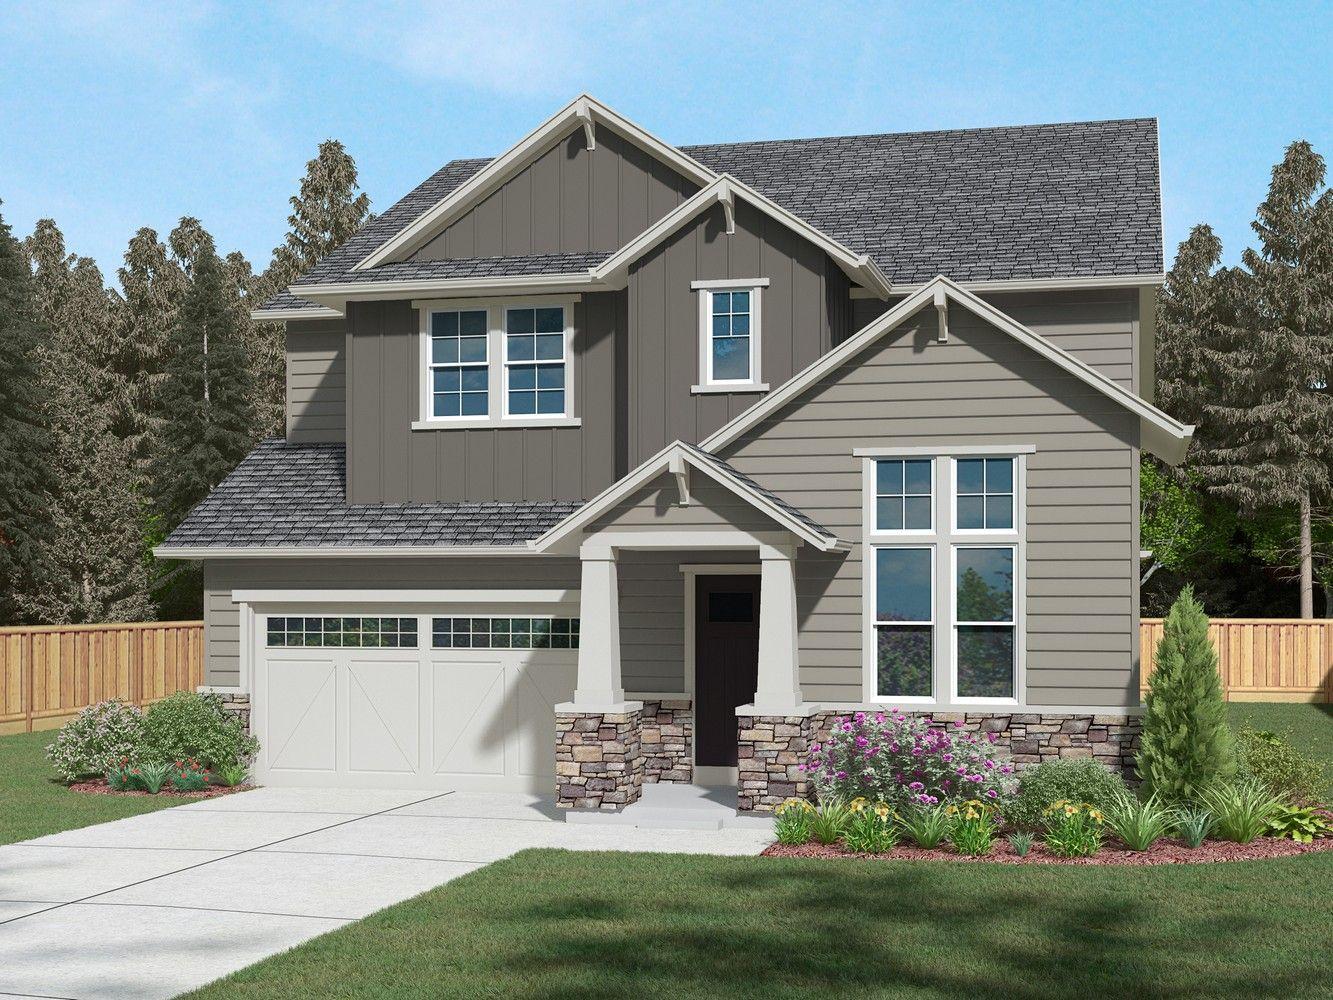 Single Family for Sale at Jacobs Landing - Residence H-390 3244 234th Pl Se Sammamish, Washington 98075 United States